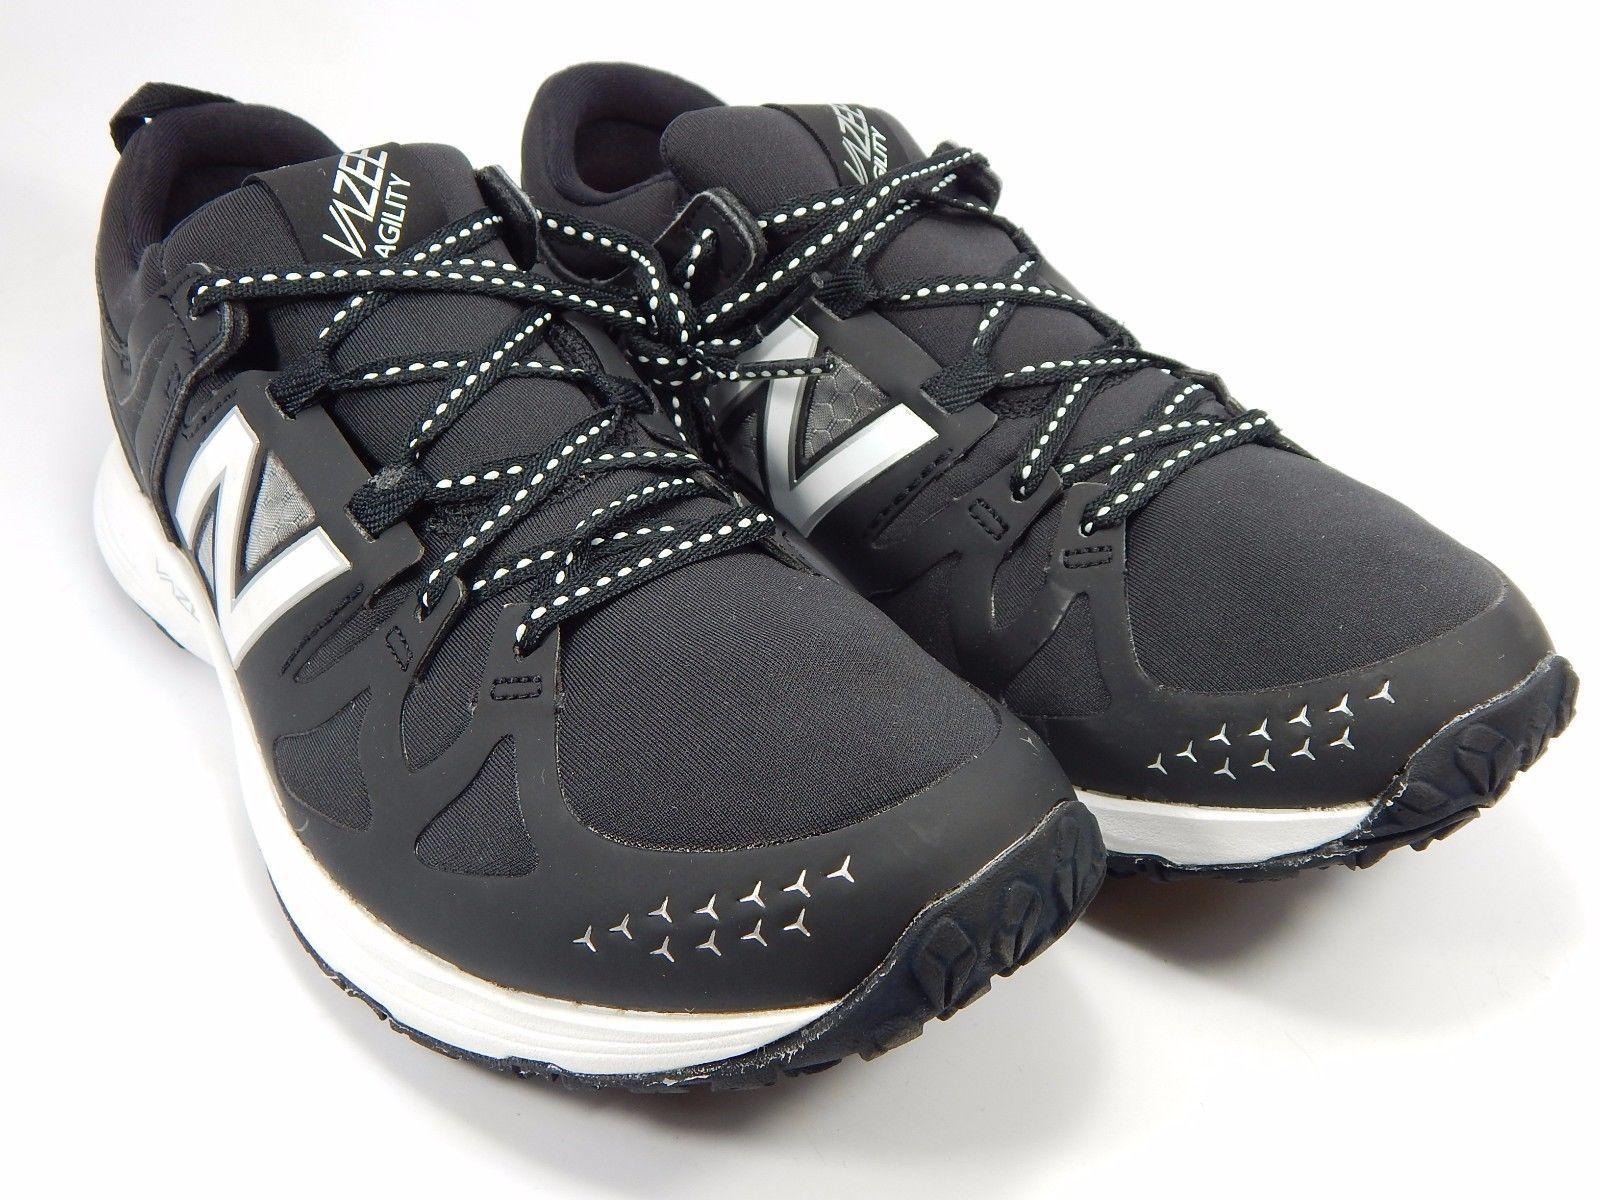 New Balance Vazee Agility Women's Cross Trainer Shoes Size US 10 M (B) EU 41.5